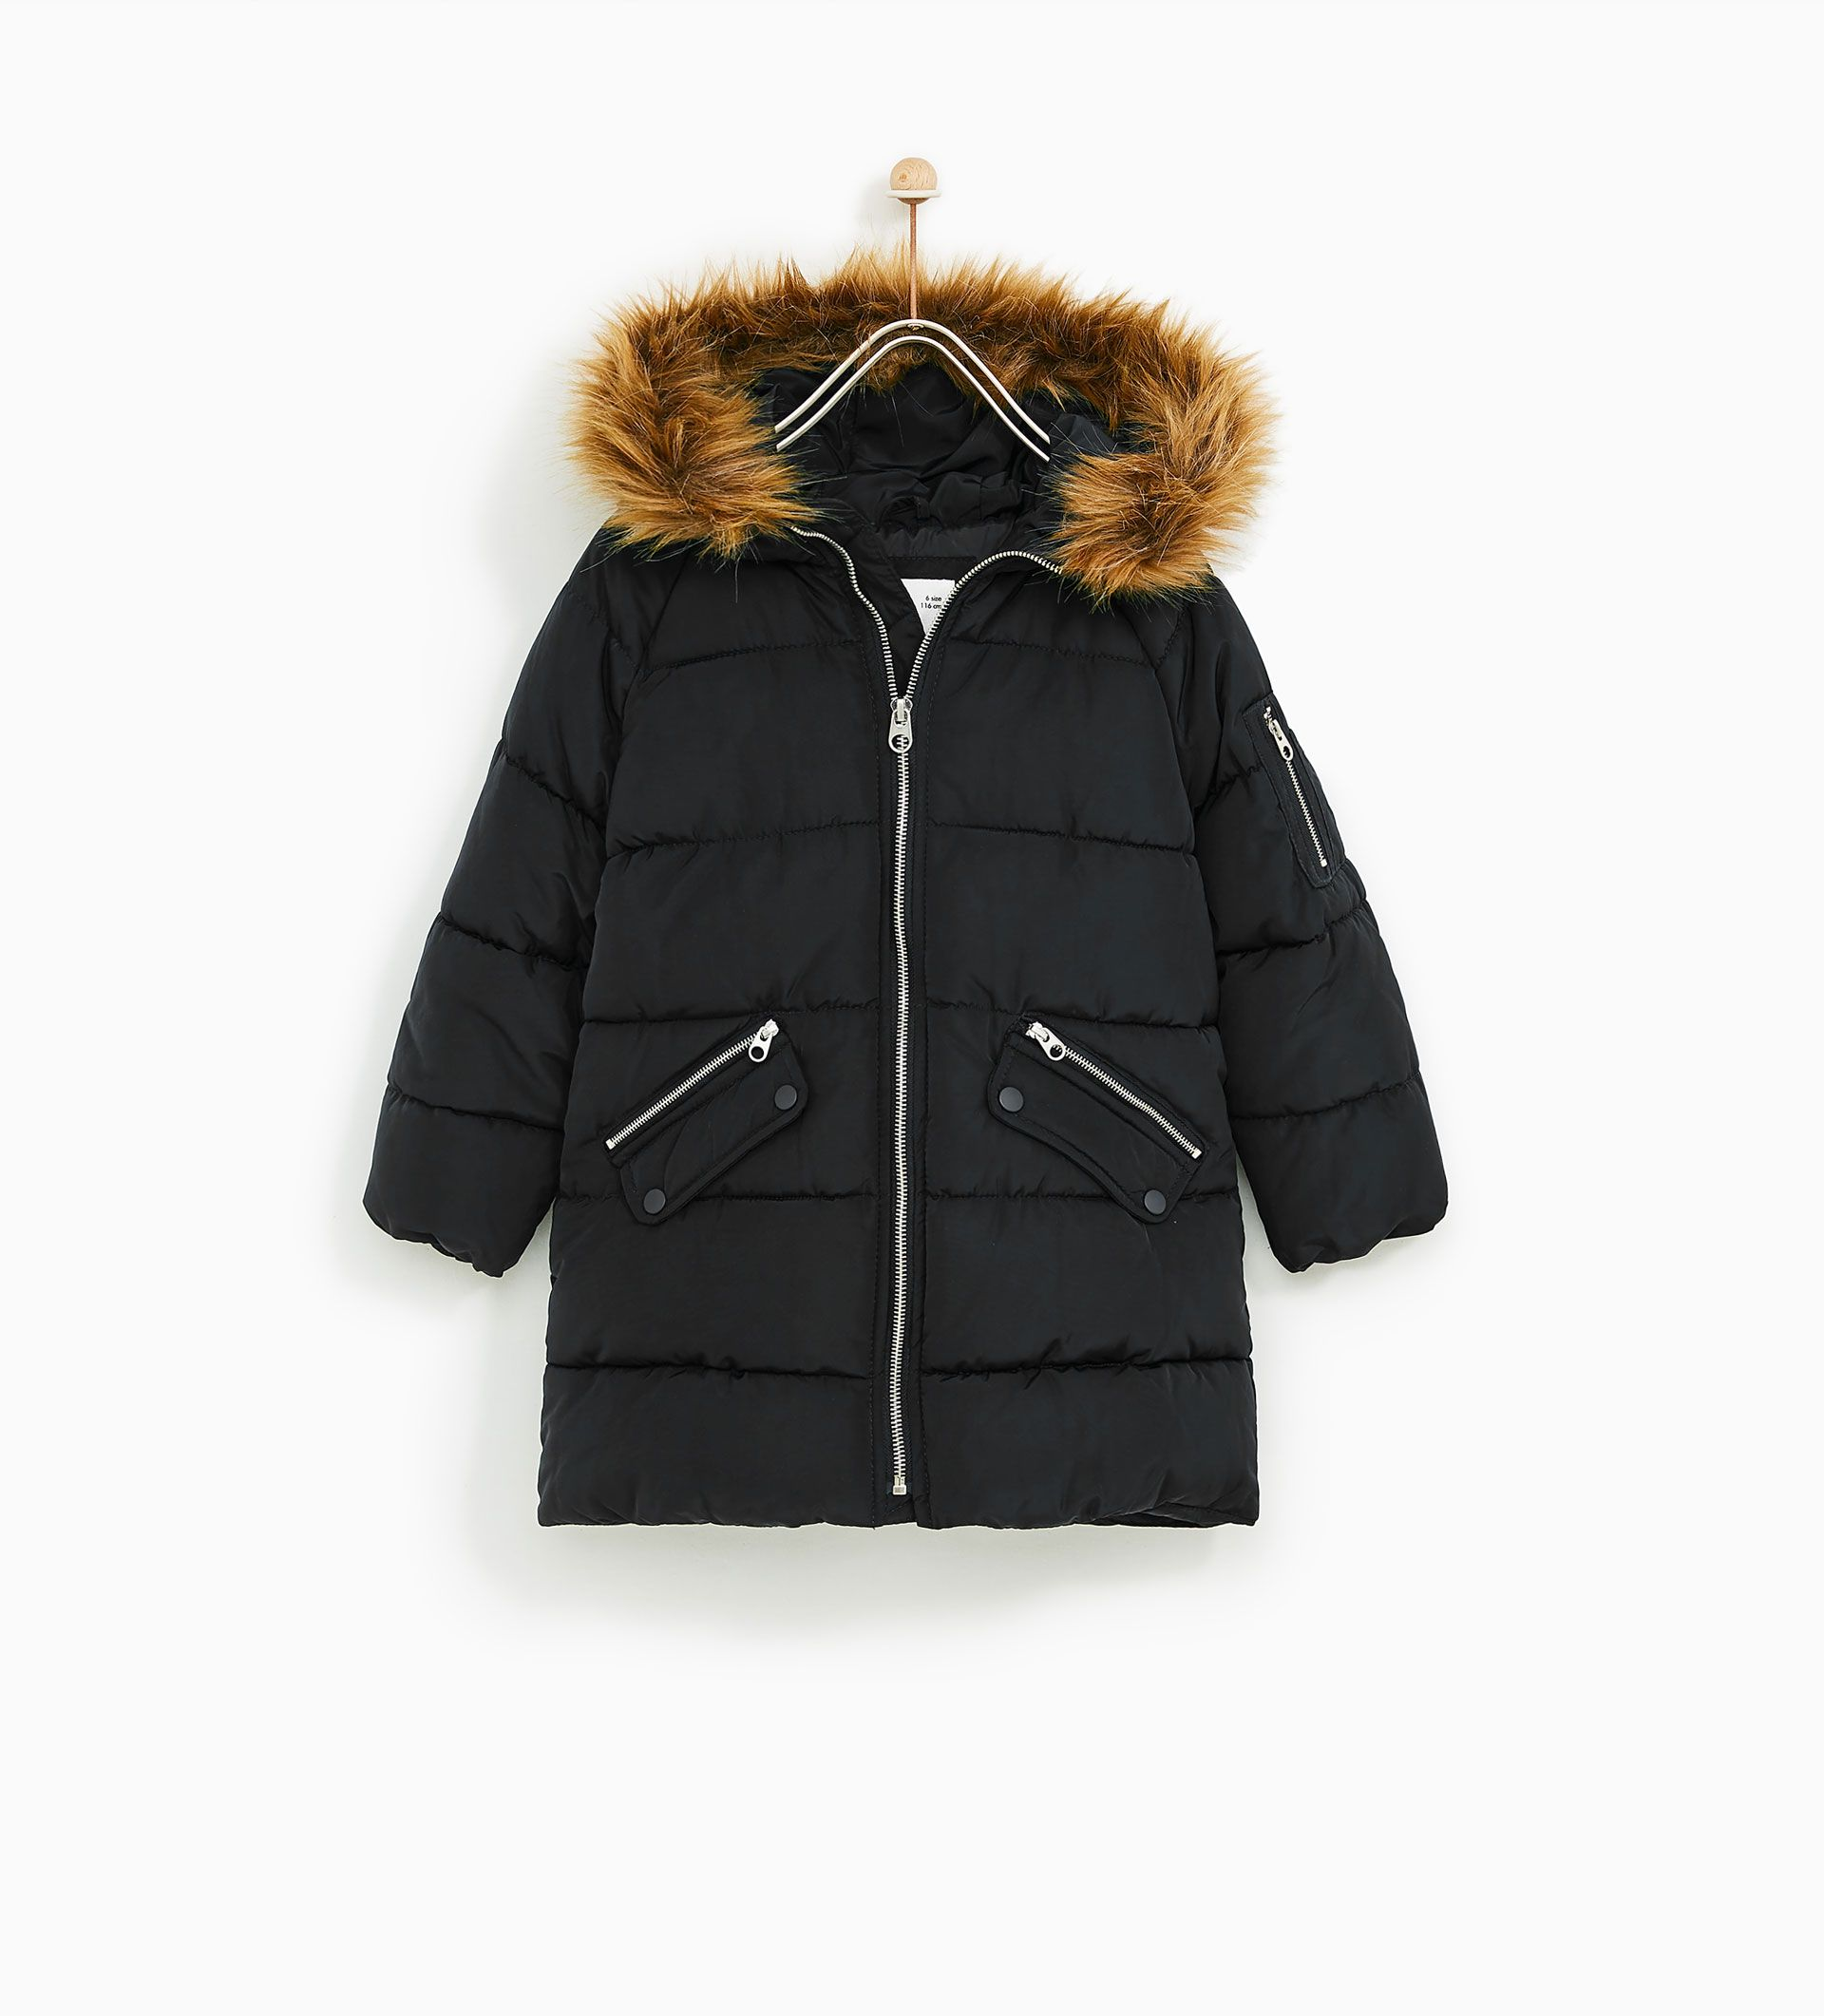 Faux Hood With Fur Coat Kids Puffer Zara vqg7ZBv